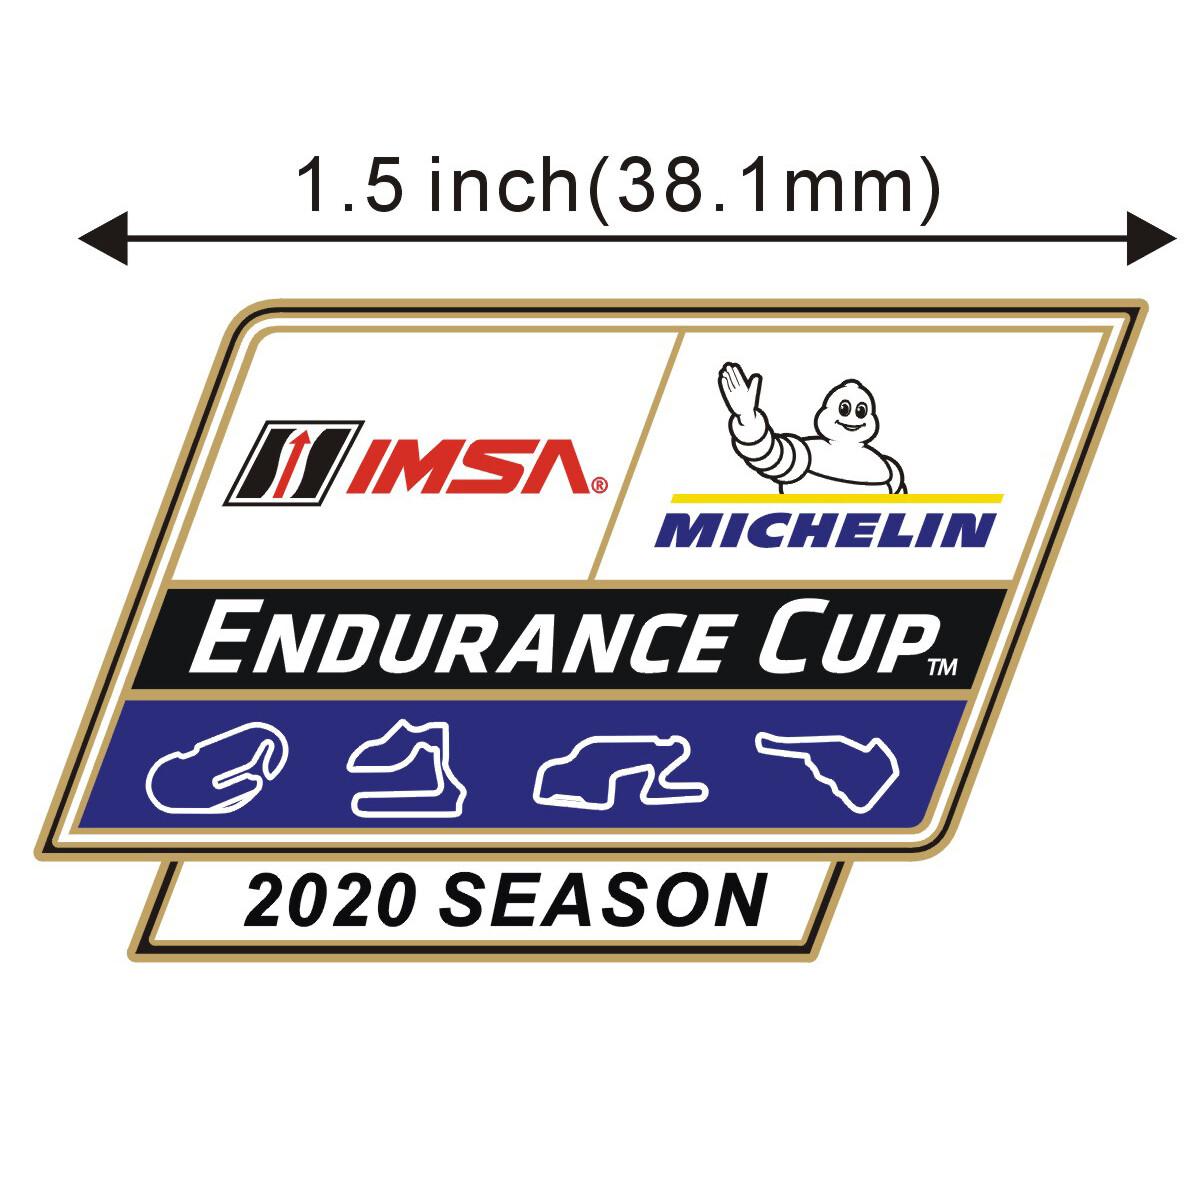 IMSA Endurance Cup 2020 Lapel Pin